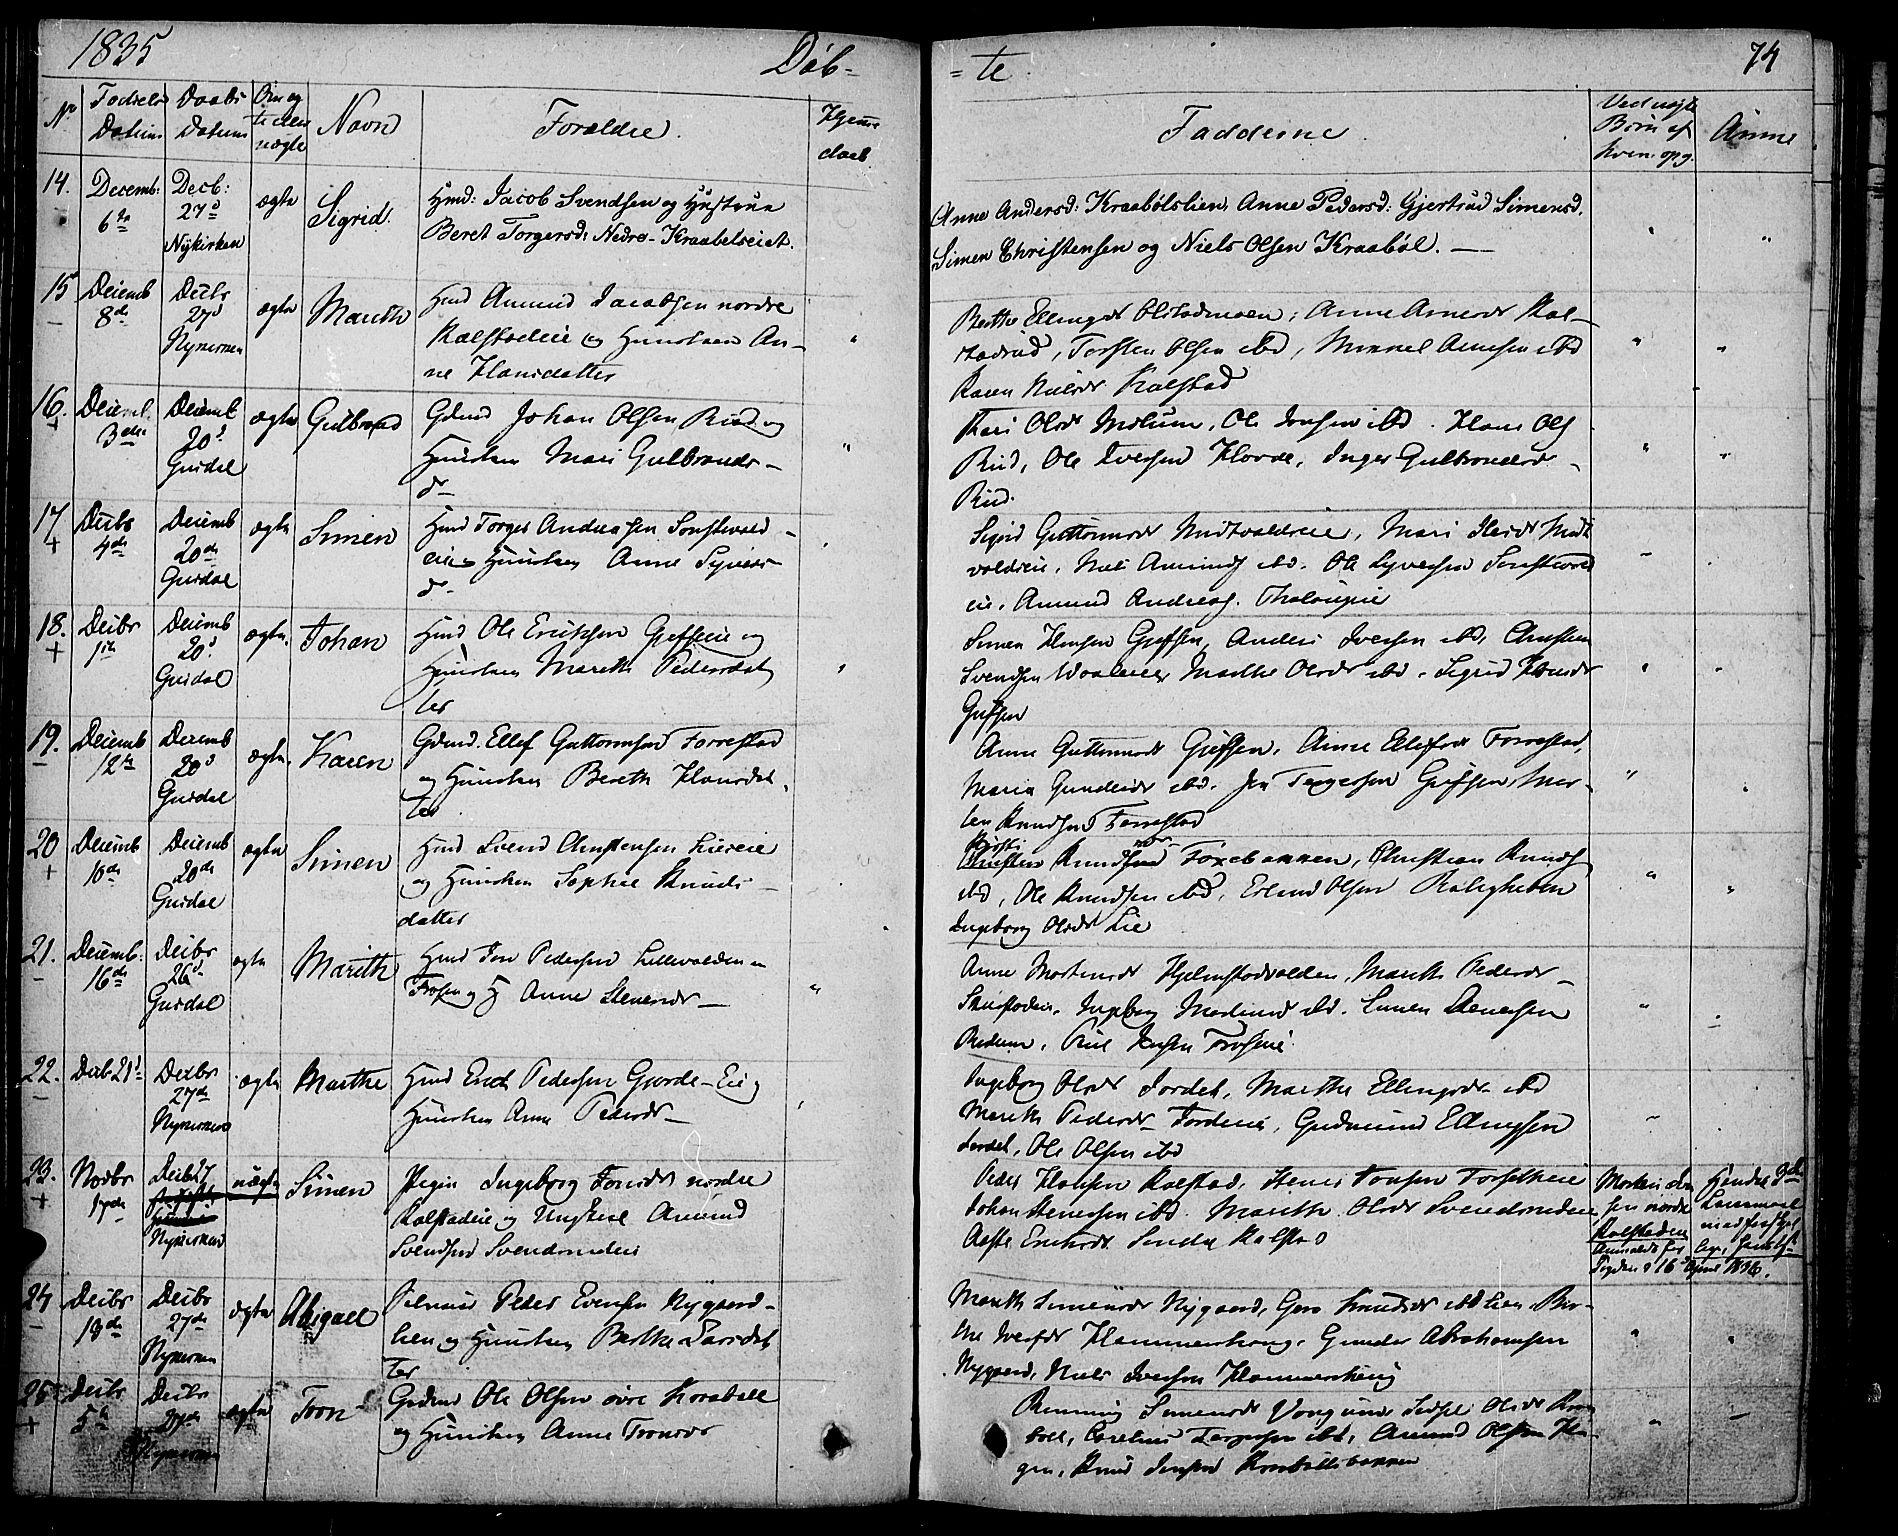 SAH, Gausdal prestekontor, Ministerialbok nr. 6, 1830-1839, s. 74